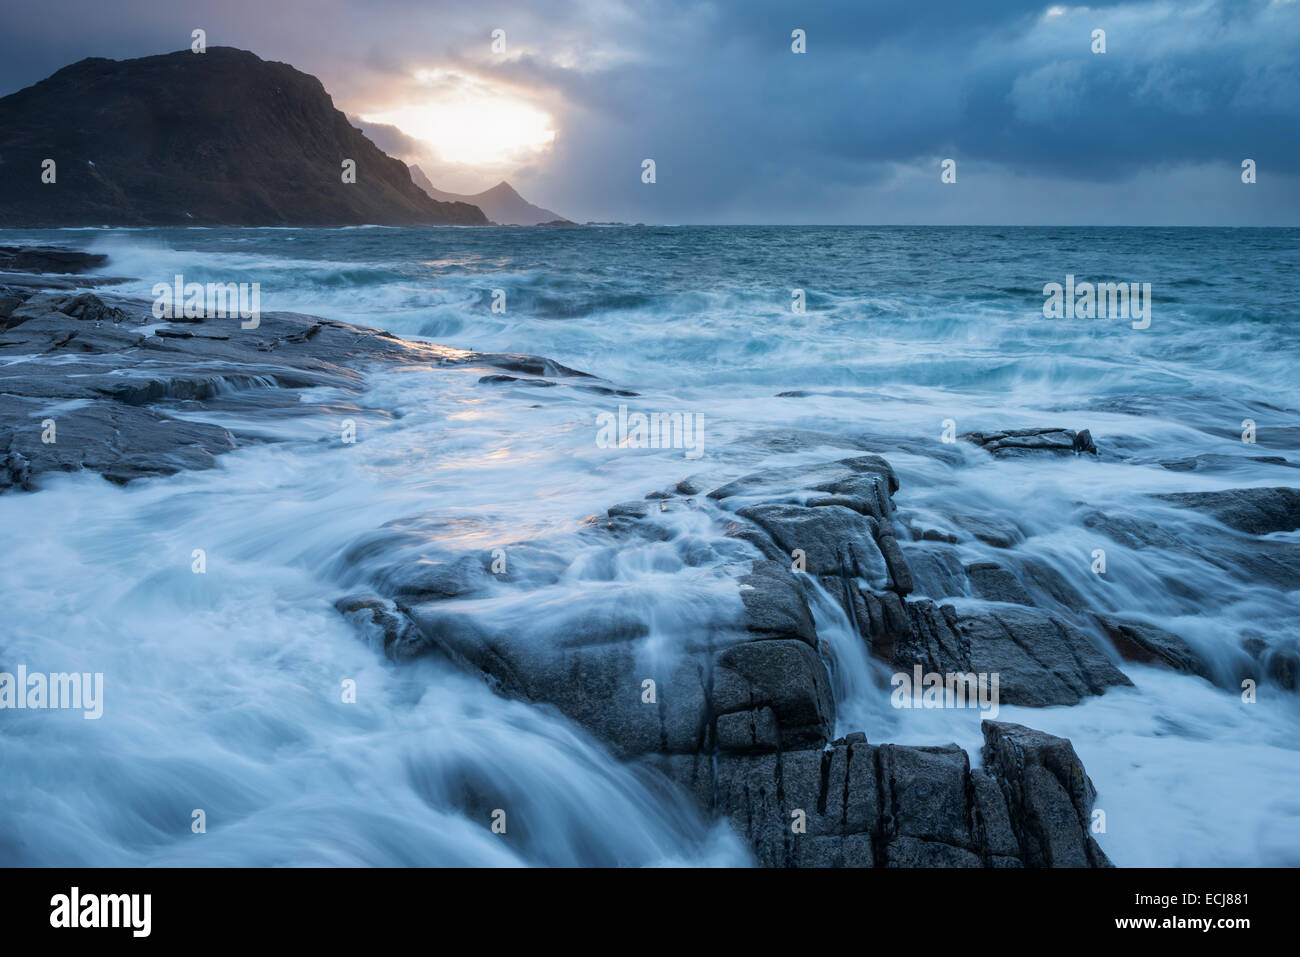 Waves crash over rocky coast of Vestvågøy during winter storm, Lofoten Islands, Norway - Stock Image